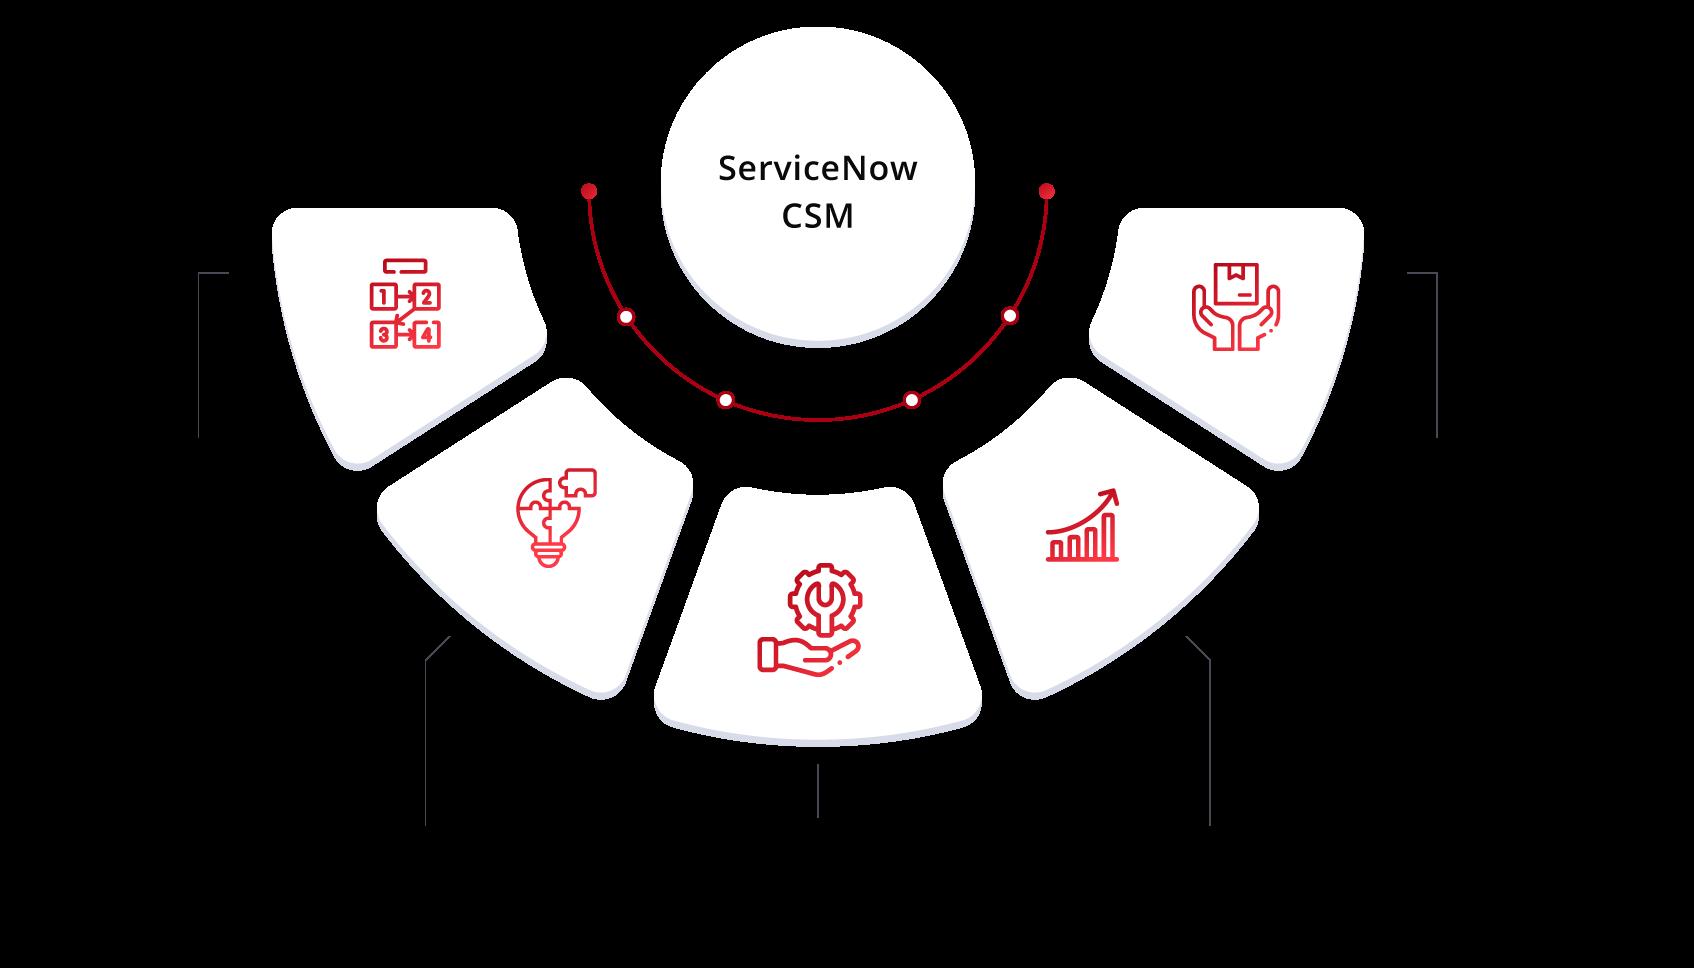 img-servicenow-csm-qbrainx-benefits